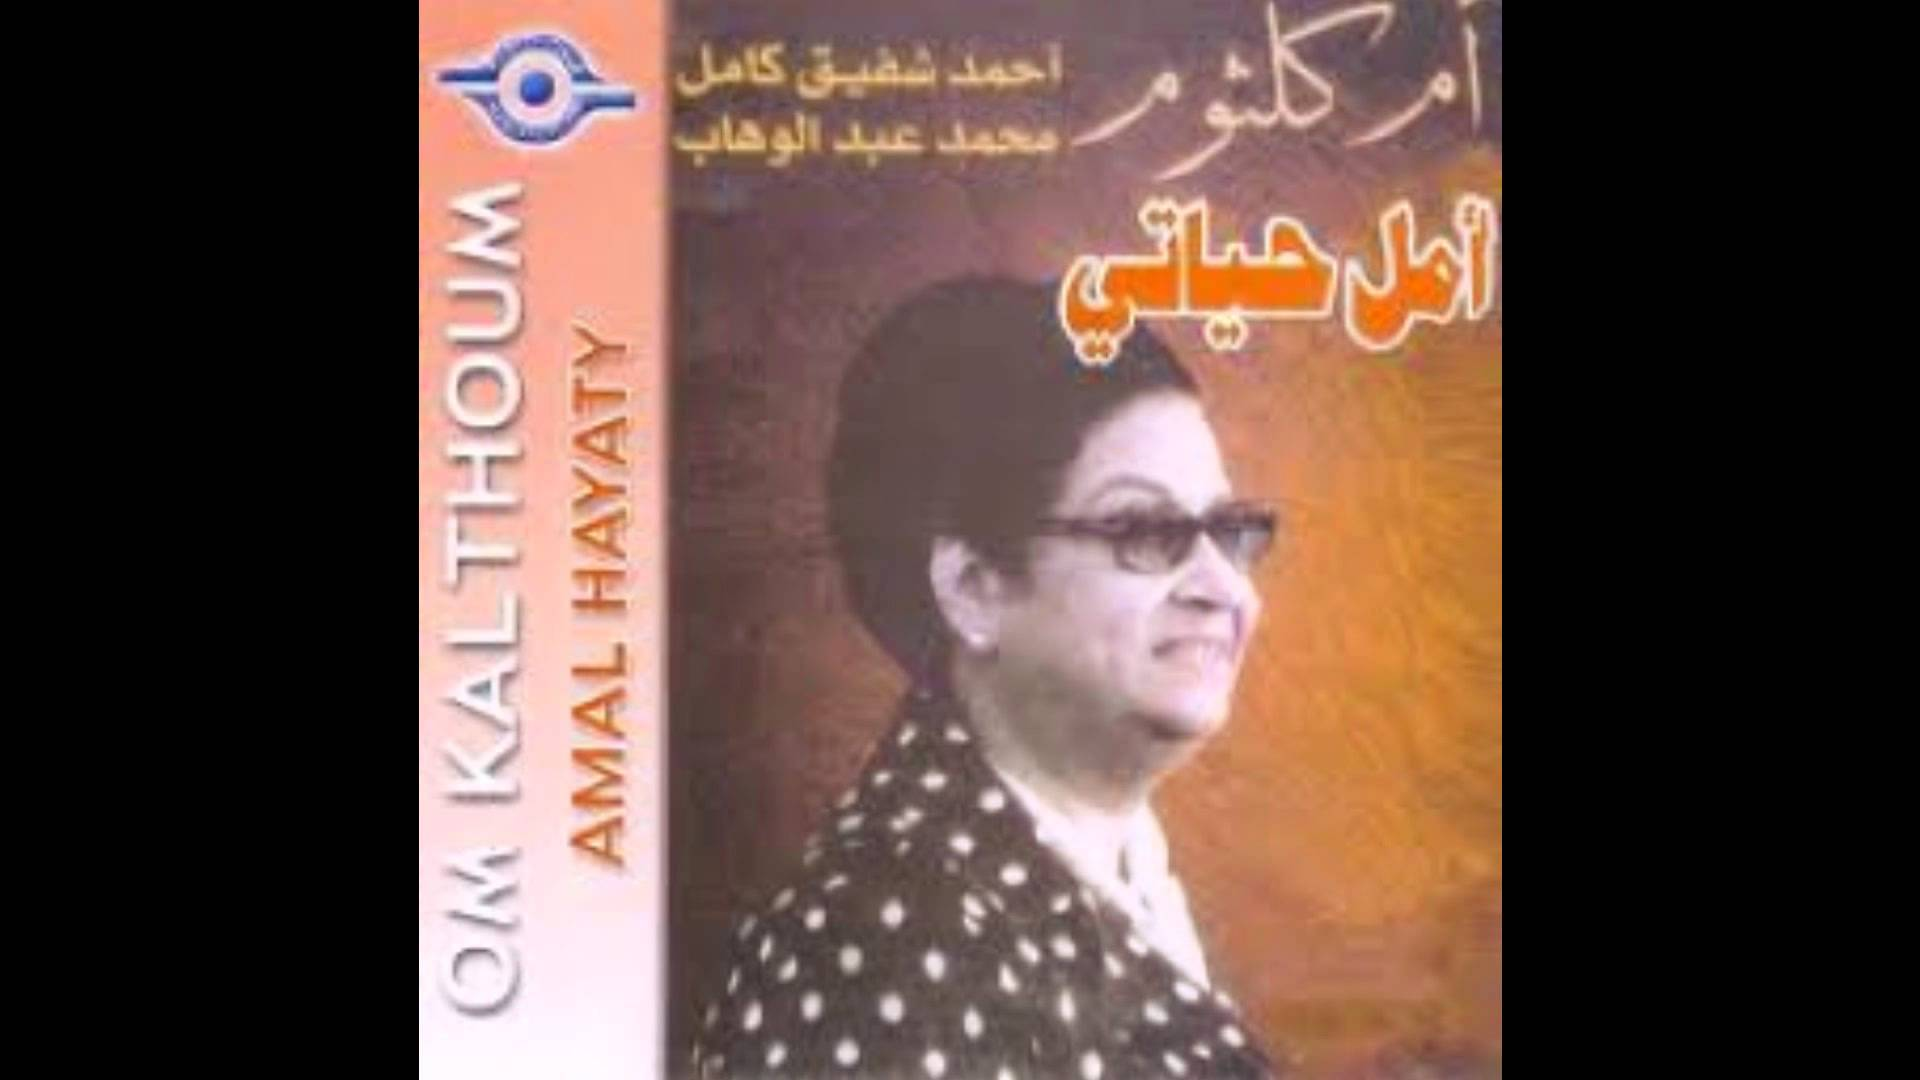 490a07474 أم كلثوم - أمل حياتي - حفلة رائعة Om Kalthoum-Amal Hayati - 716 La Vie